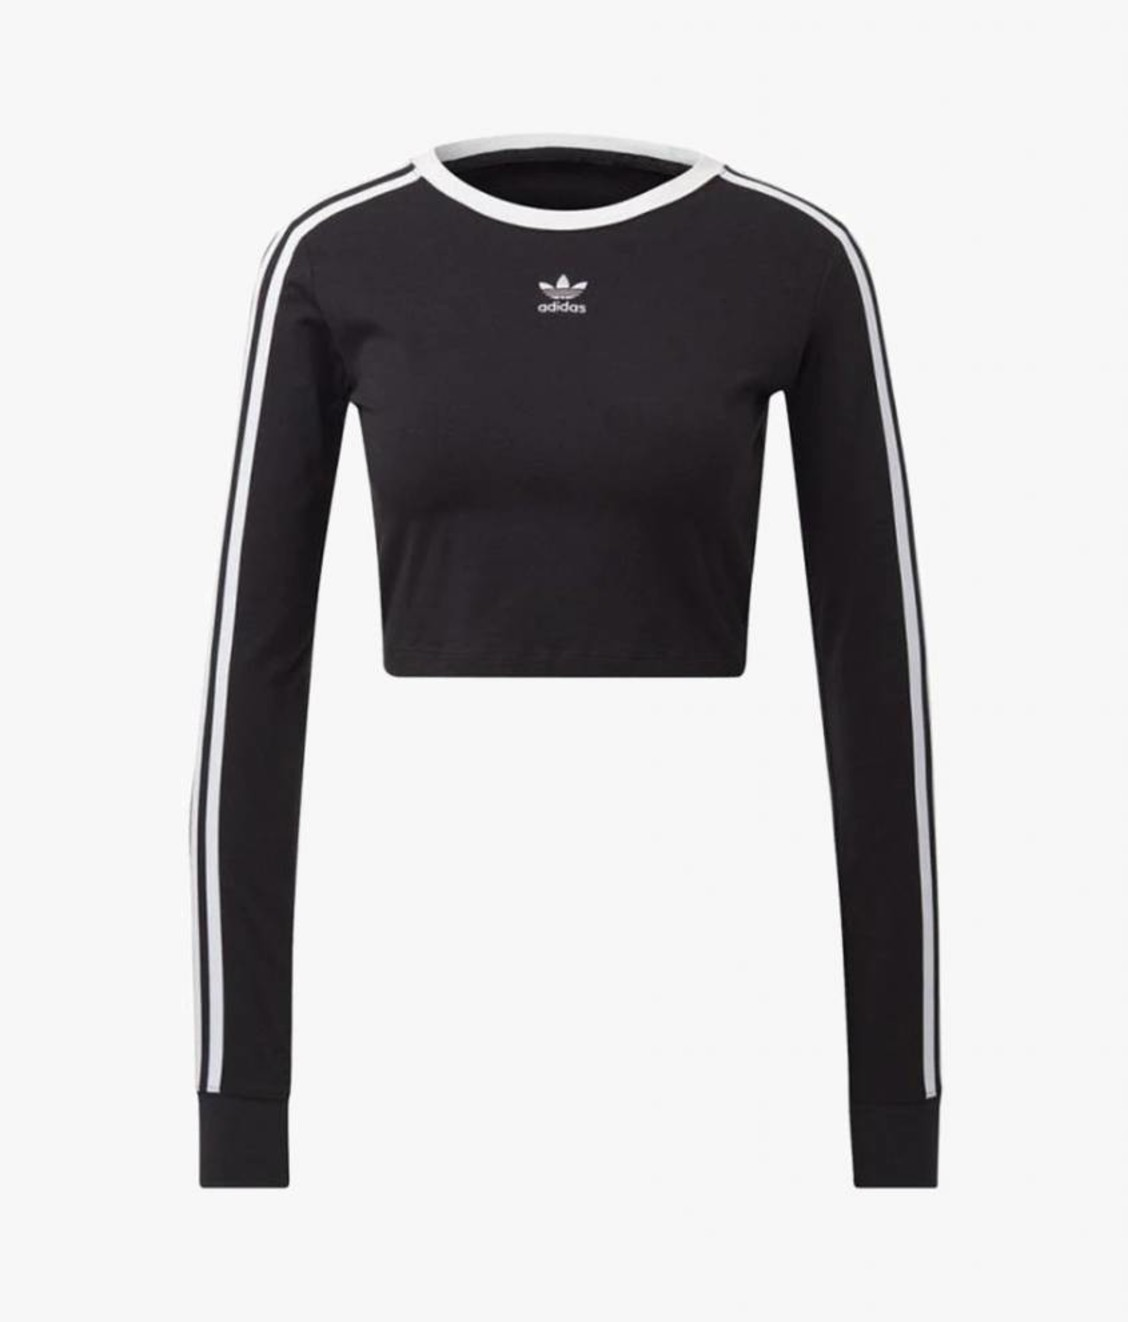 Adidas Adidas Cropped 3 Stripe LS Black White